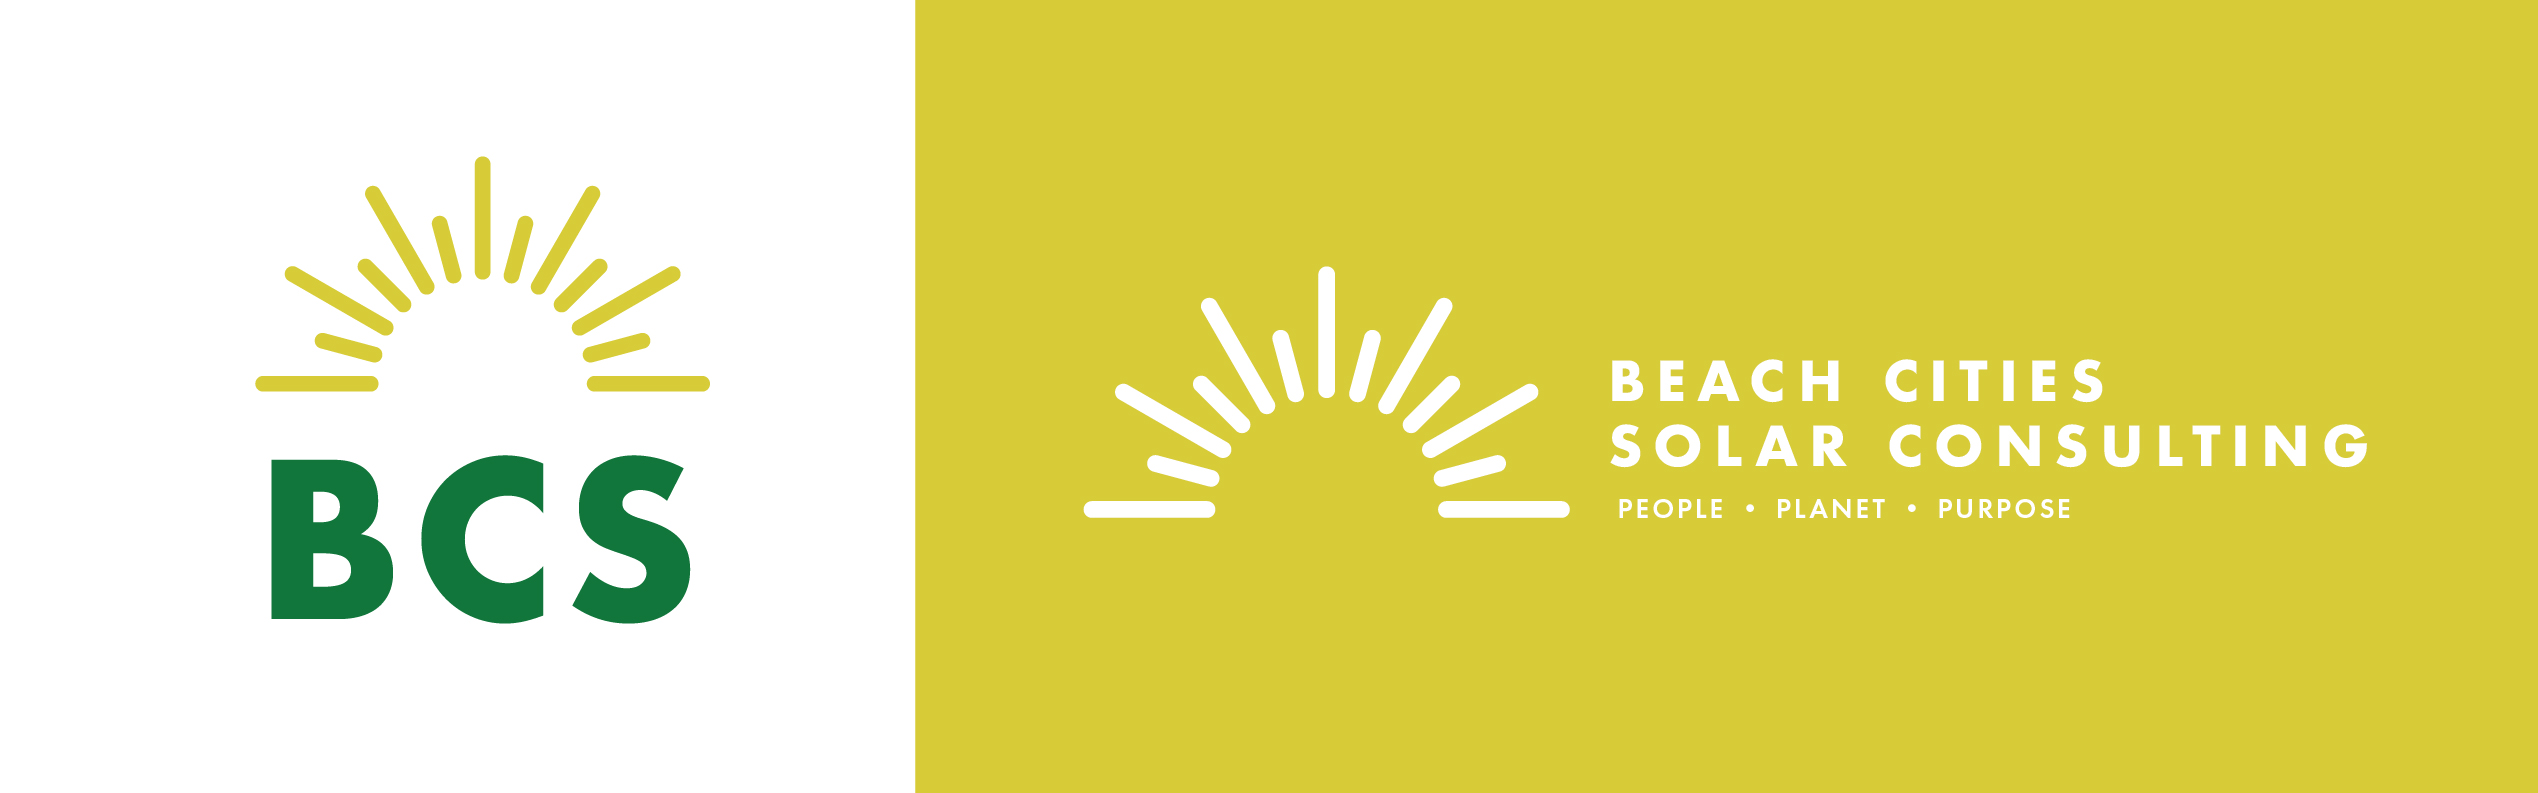 Beach_Cities_Solar_Logos_By_Stellen_Design_Profile_1-01